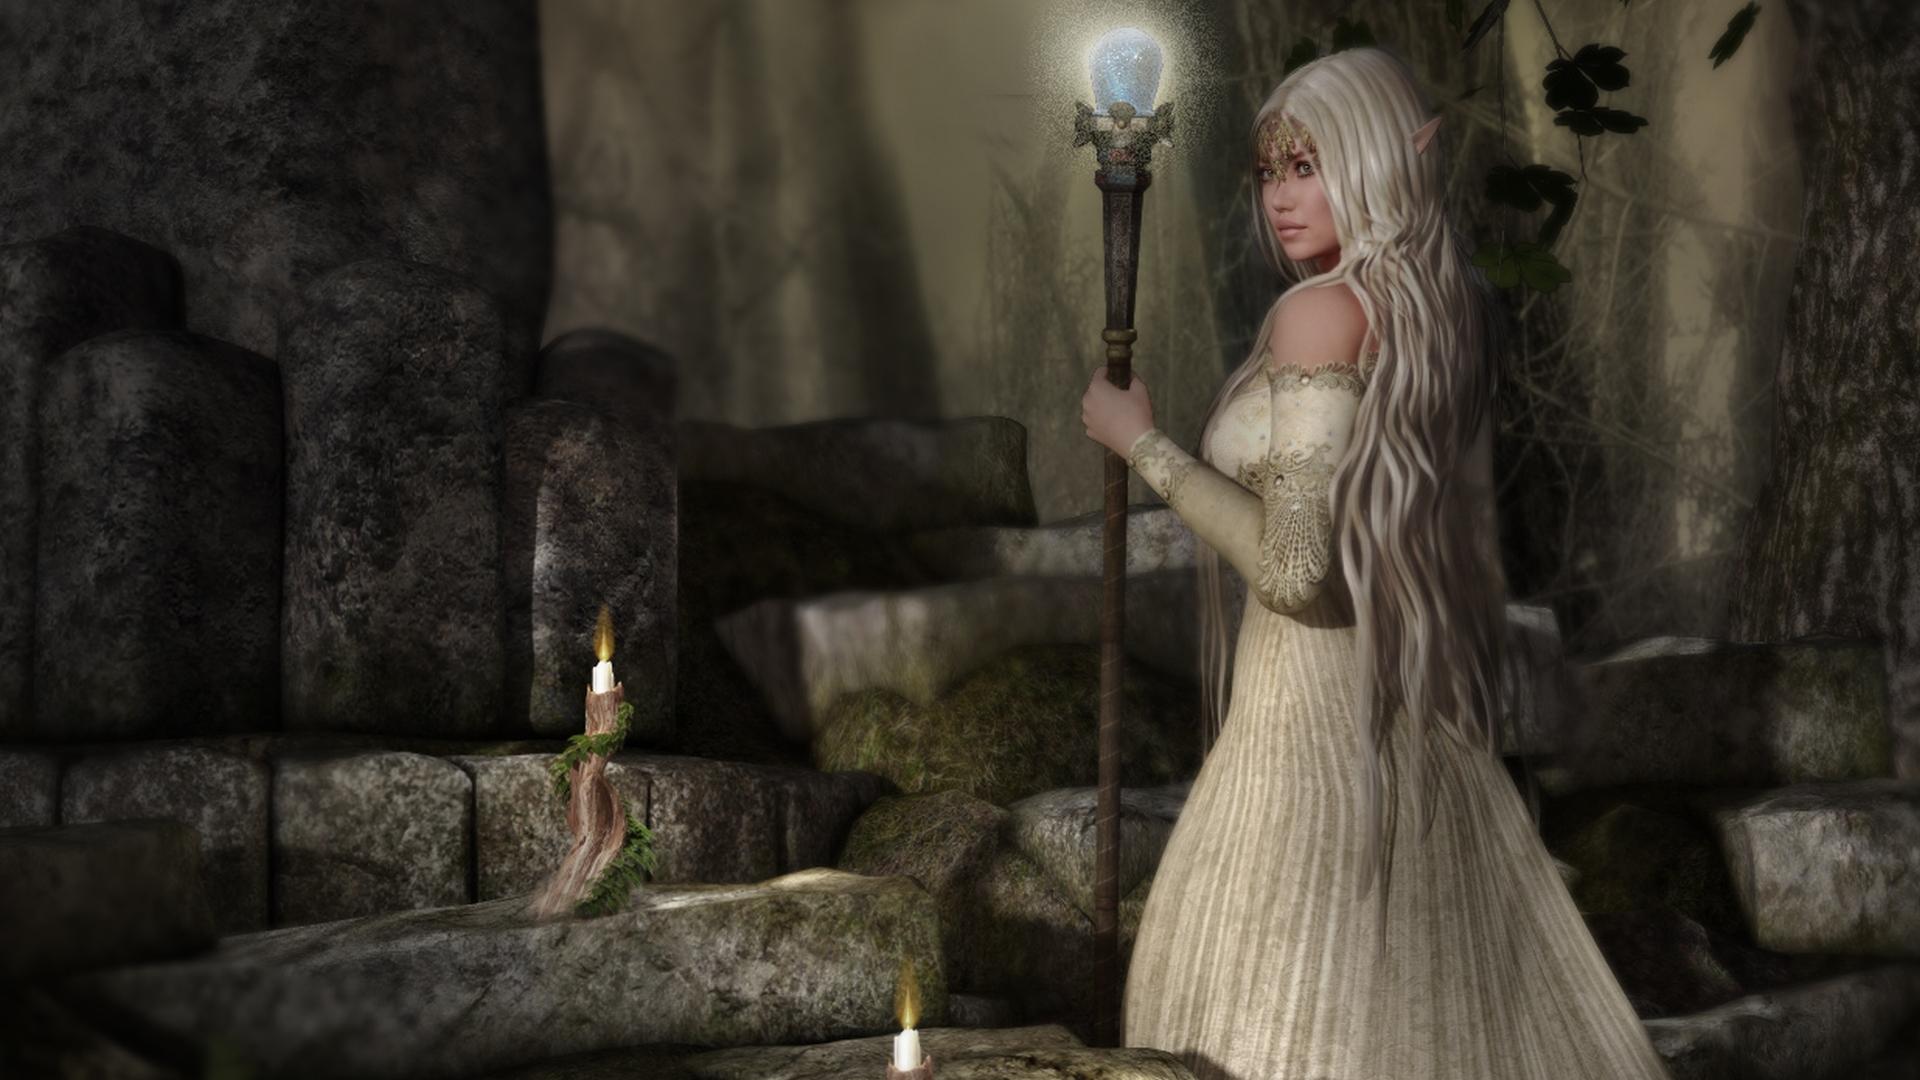 Fantasy   Witch Wallpaper 1920x1080